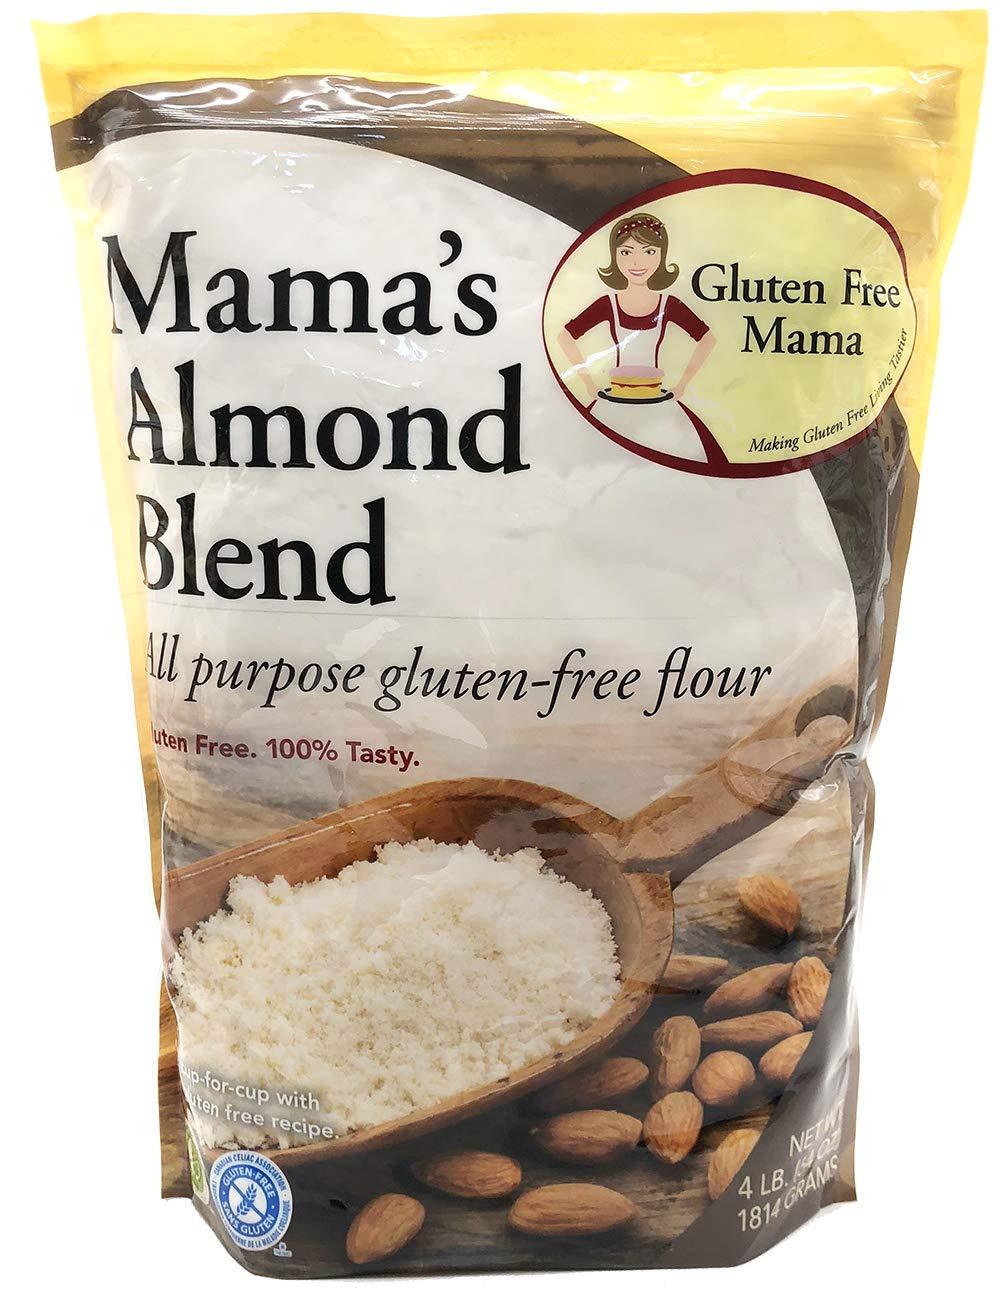 Gluten Free Mama's: Almond Blend Flour - Gluten Free Flour - Non-Gritty Texture - Great Flavor for Recipes - Certified Gluten Free Ingredients - All Purpose - Safe for Celiac Diet